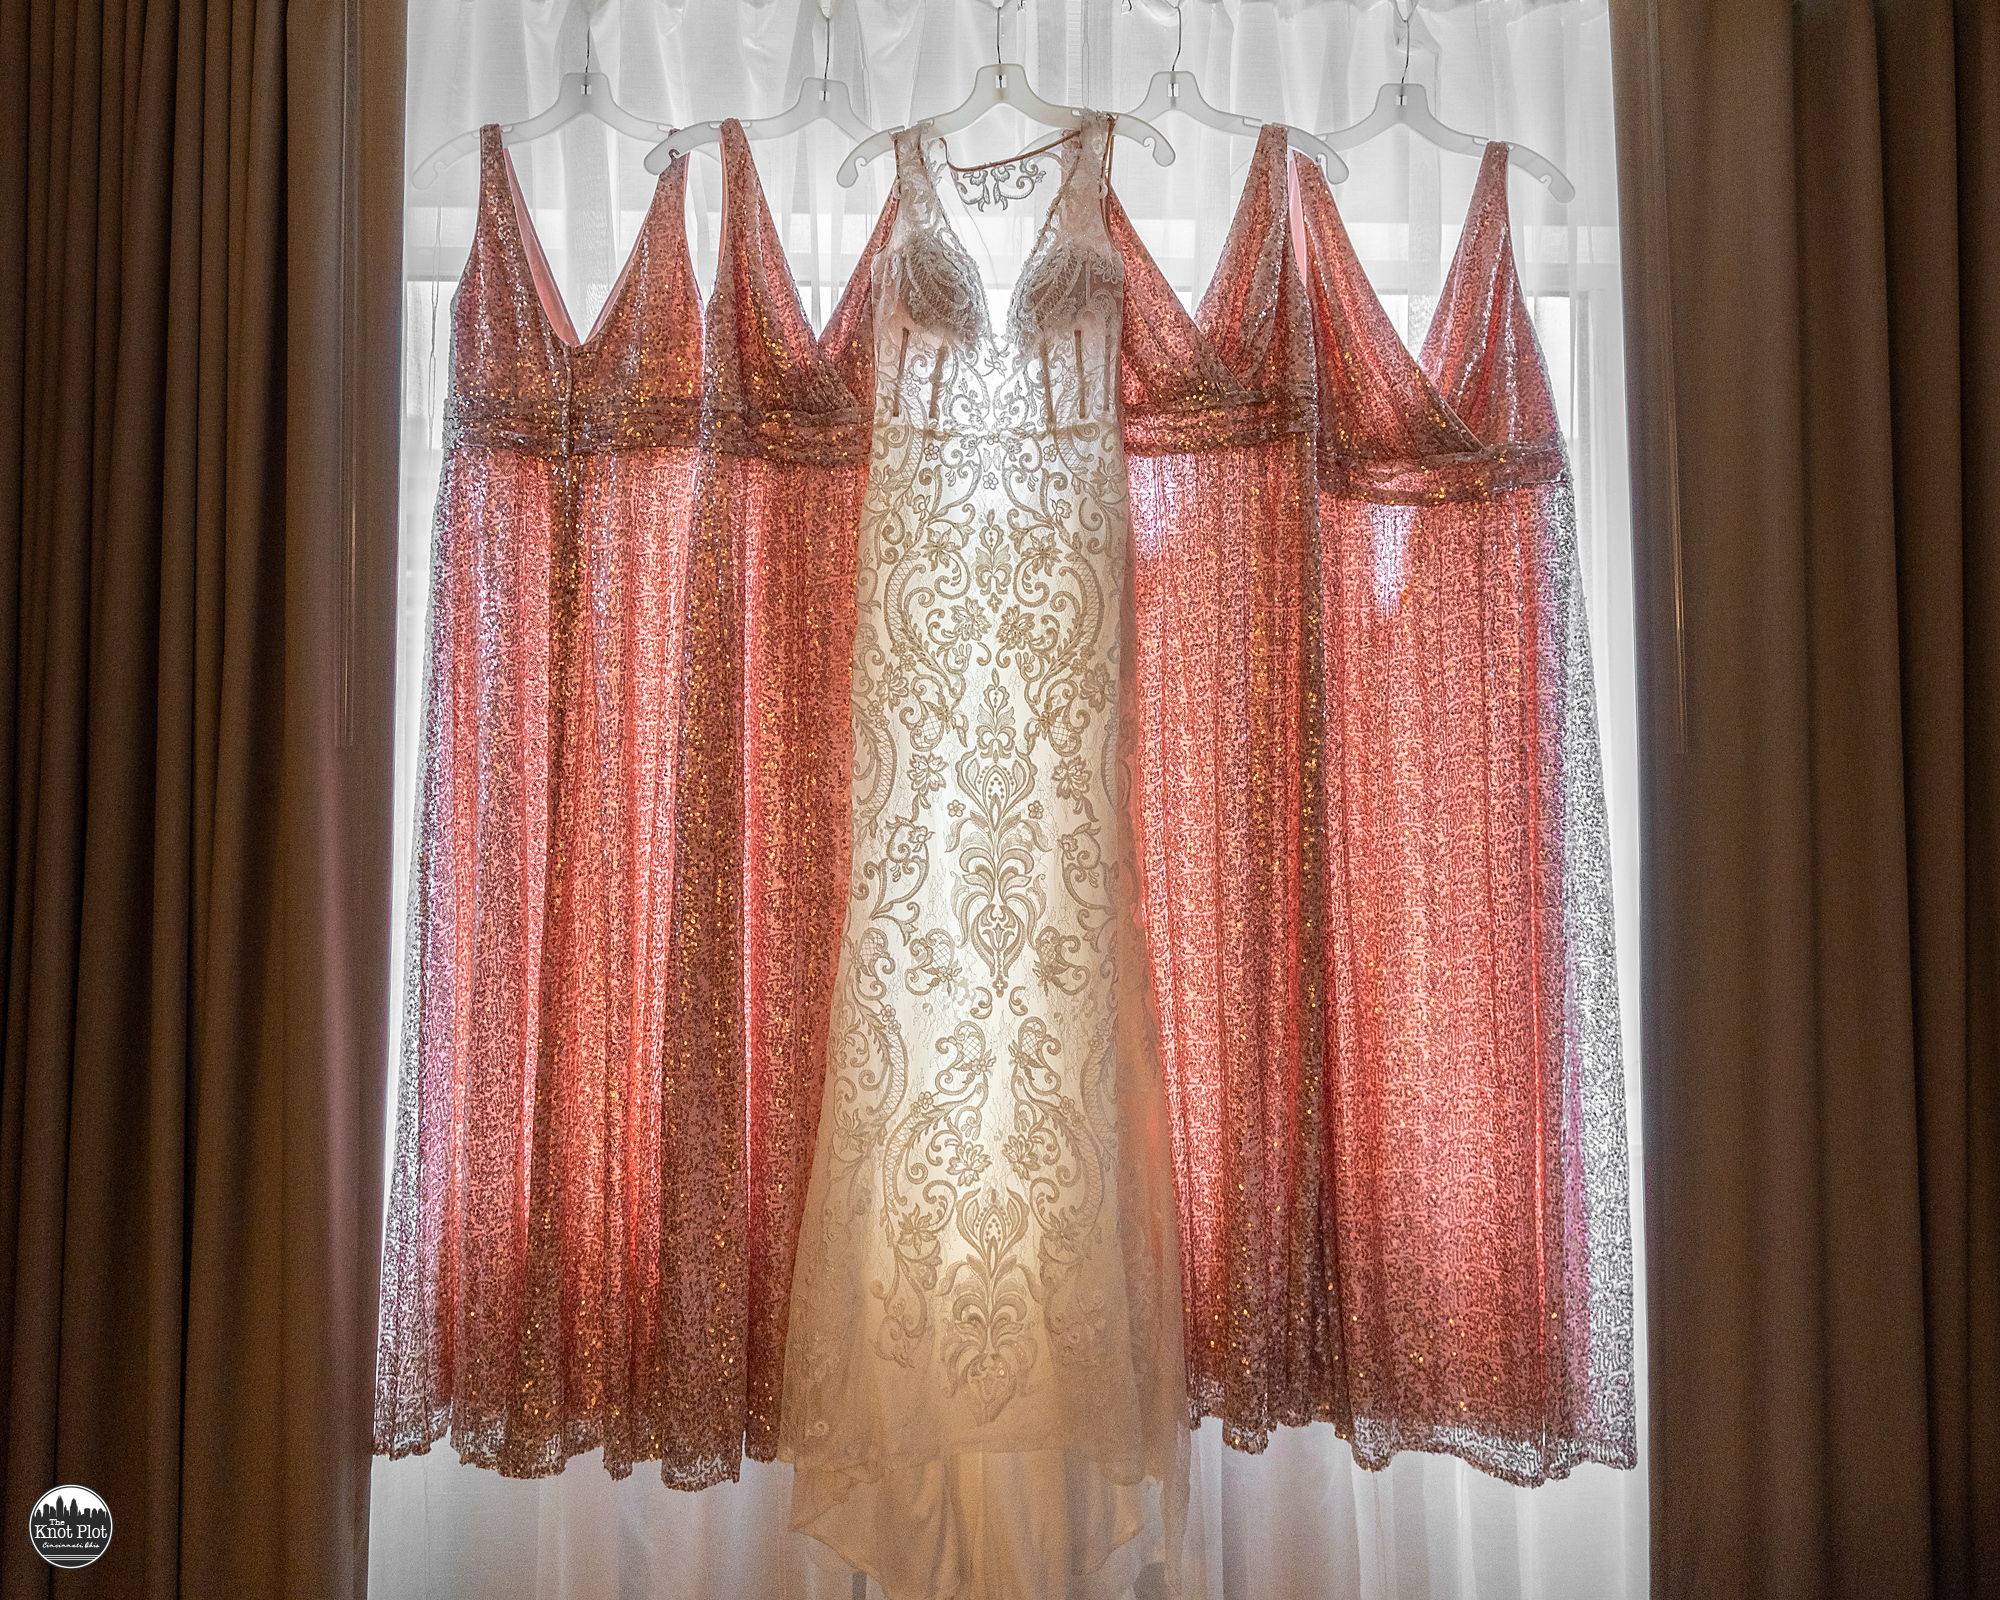 Embassy-Suites-Rivercenter-Cincinnati-Wedding-Photography-3.jpg